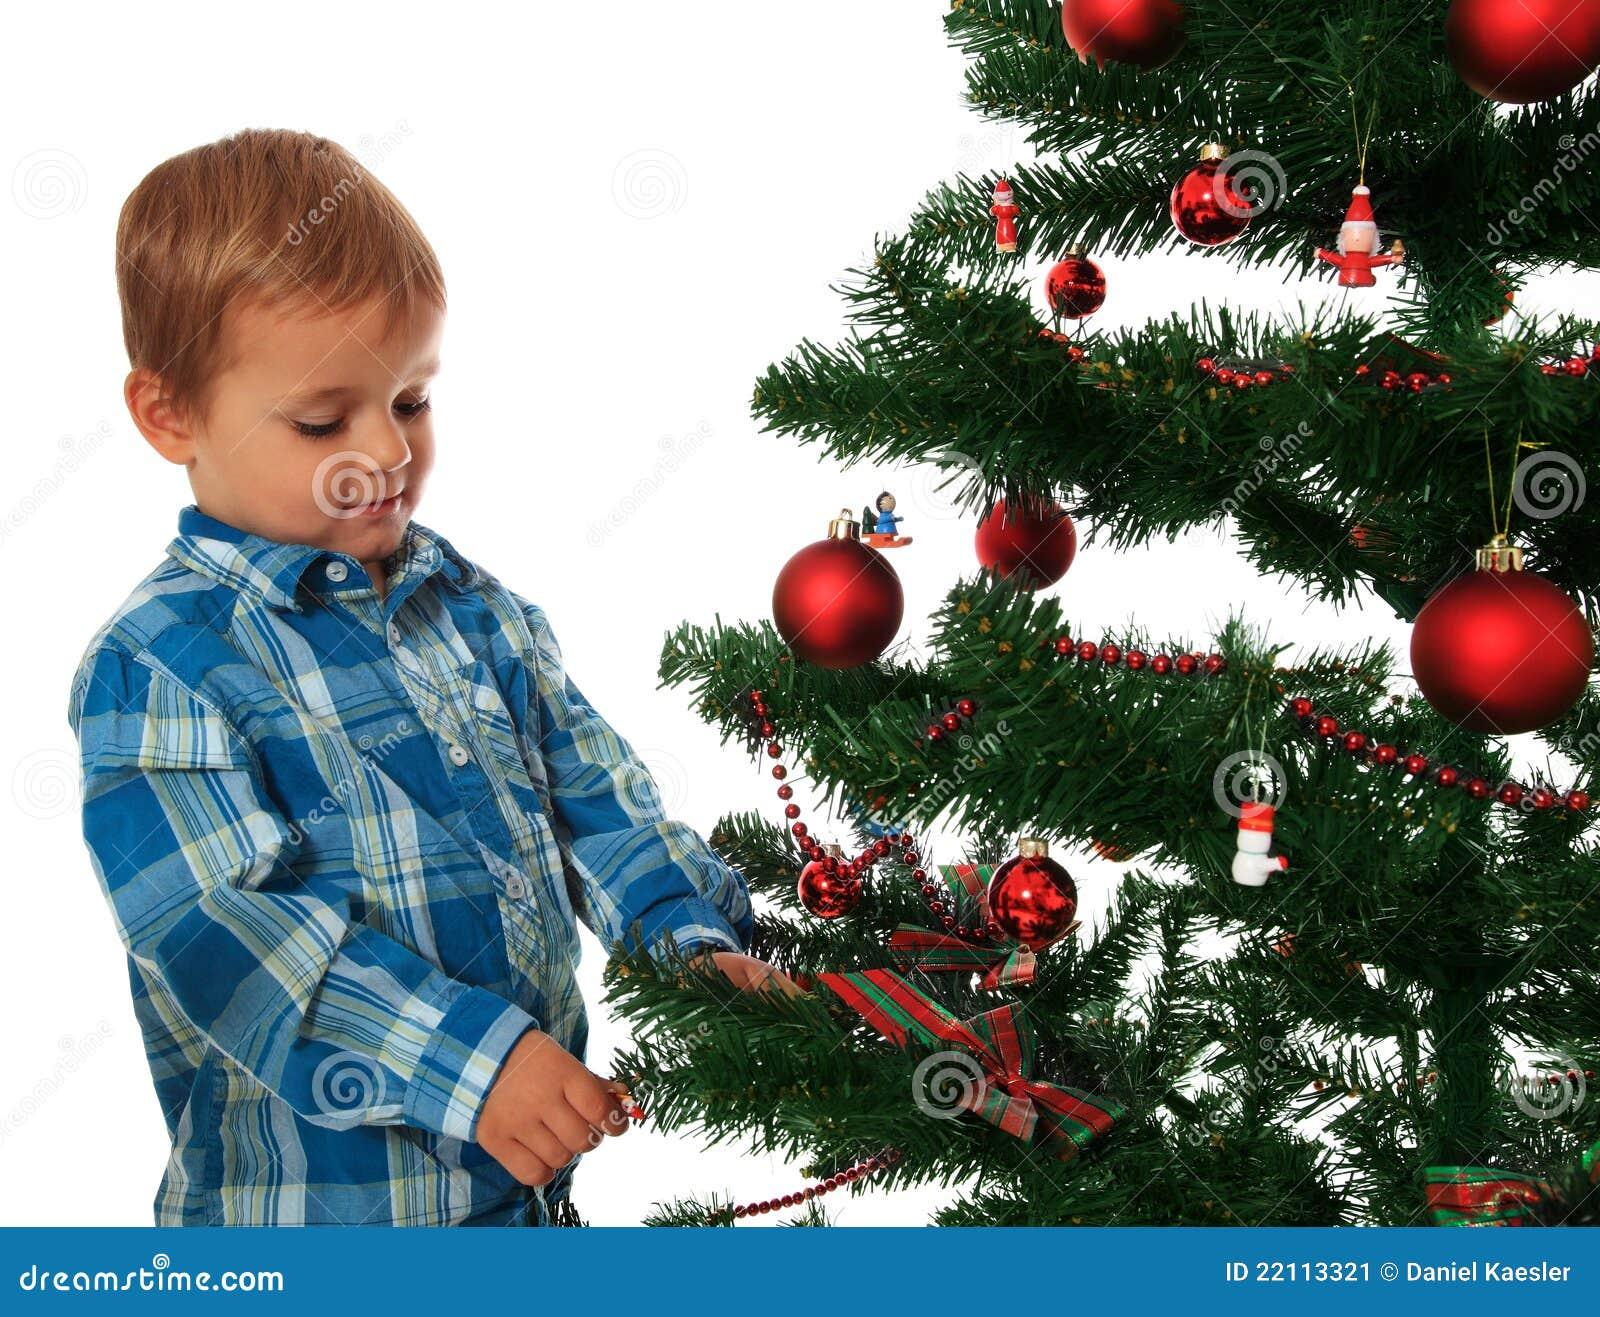 Kids Decorating Christmas Tree: Kid Decorating Christmas Tree Stock Image